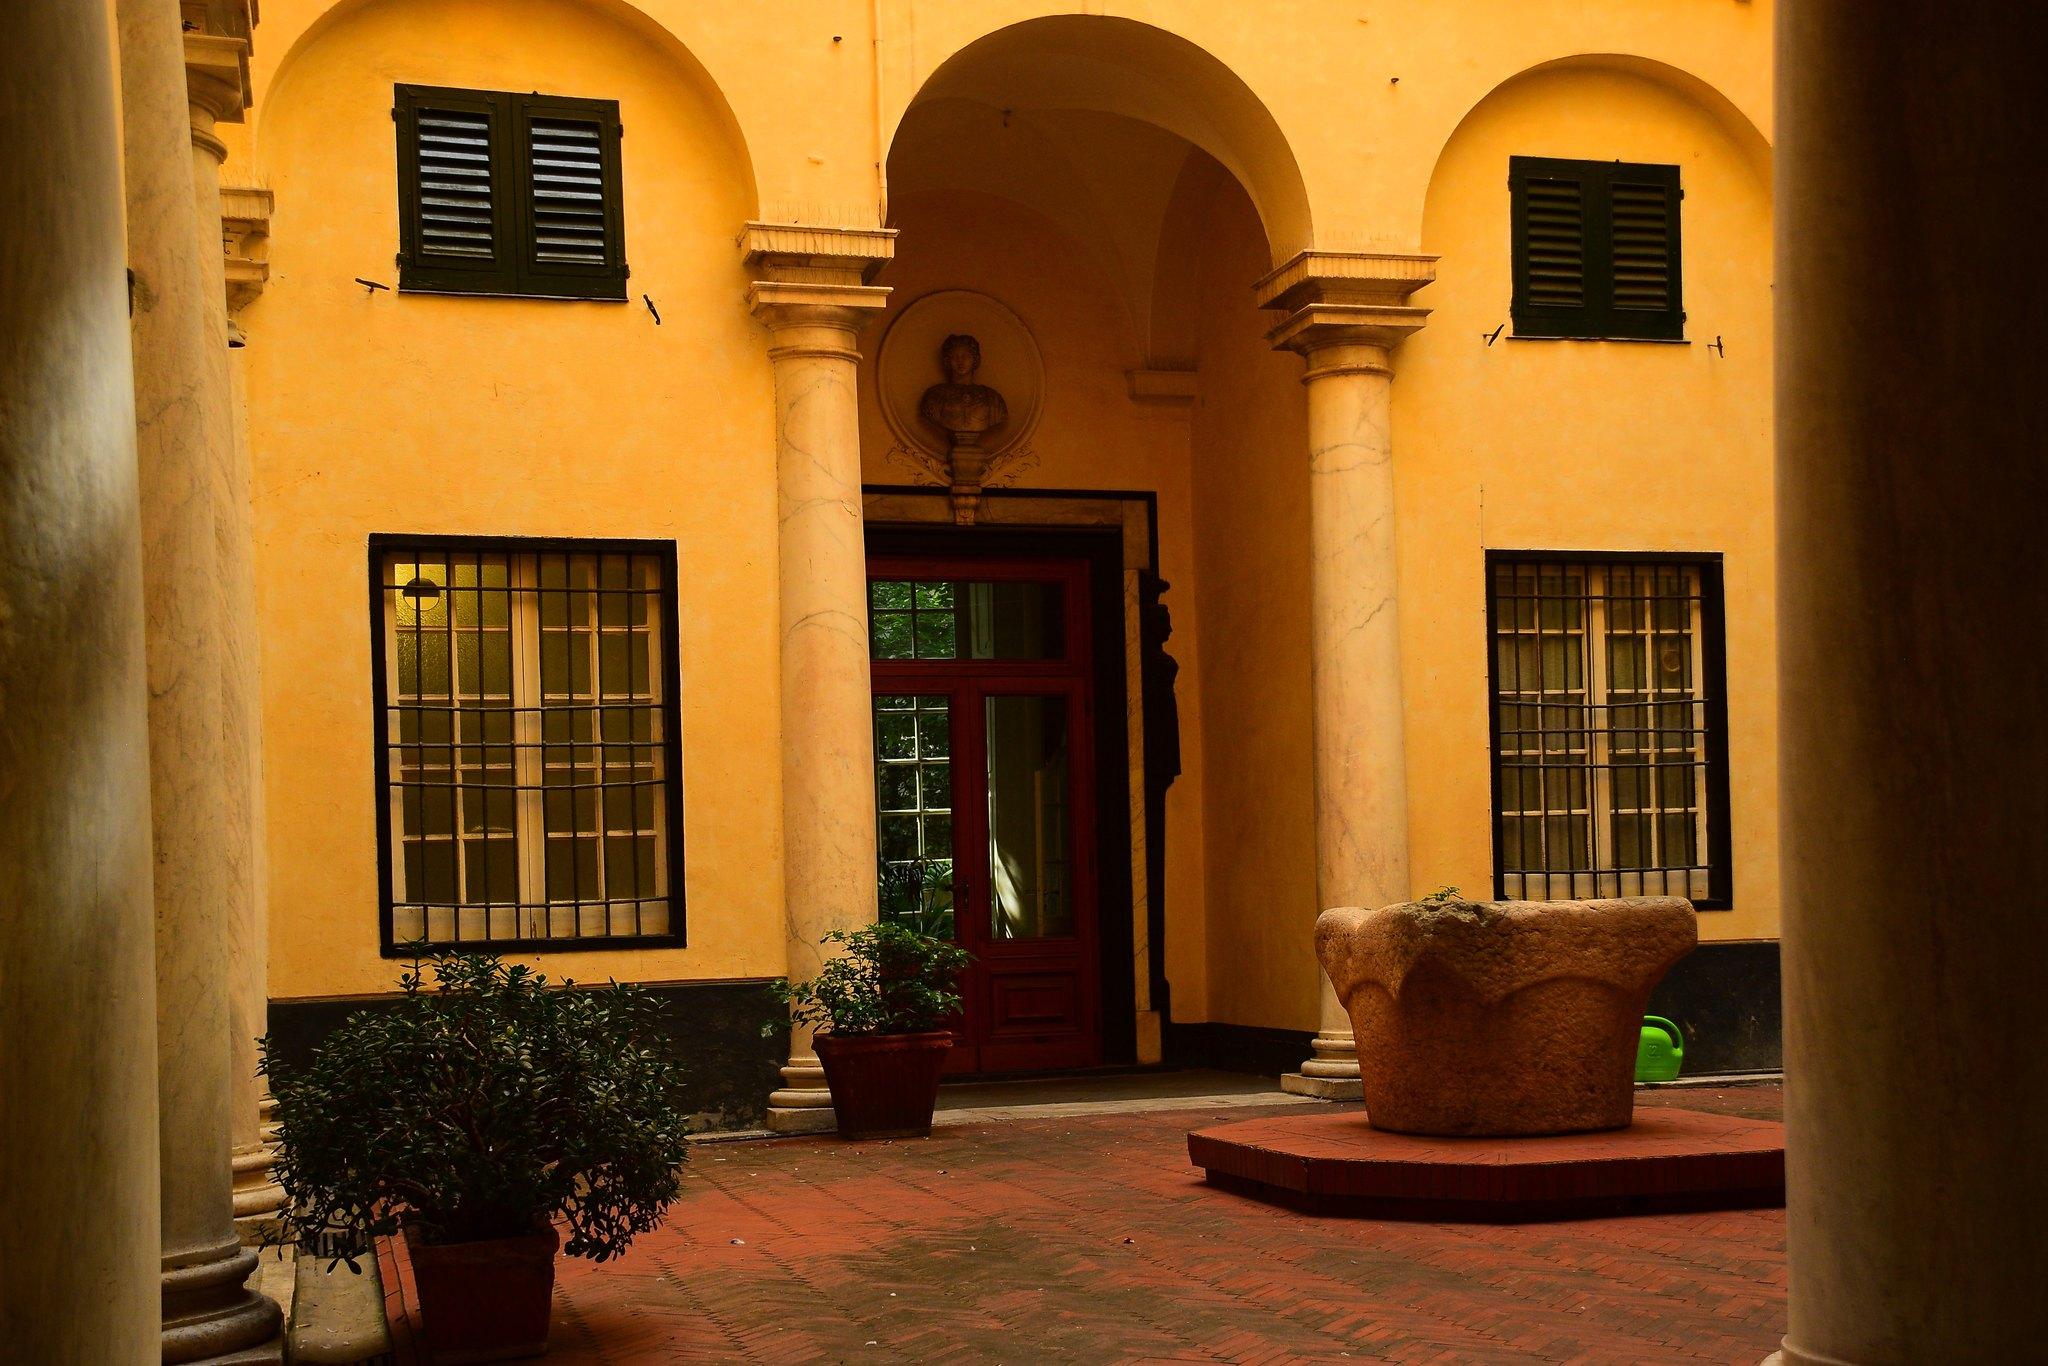 palazzo spinola genova storia